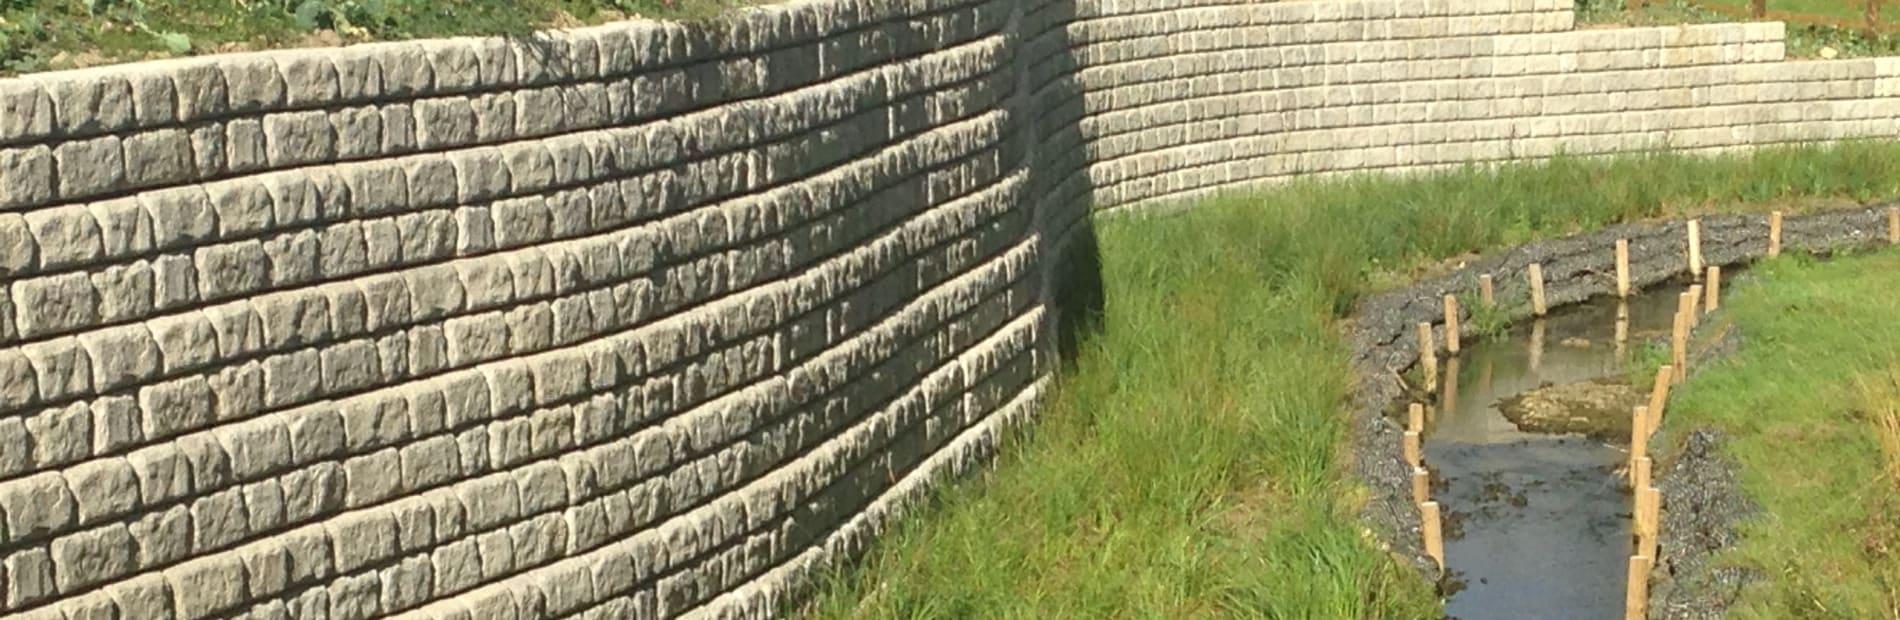 Redi-Rock™ walling used in Woodthrope Notts, by a stream